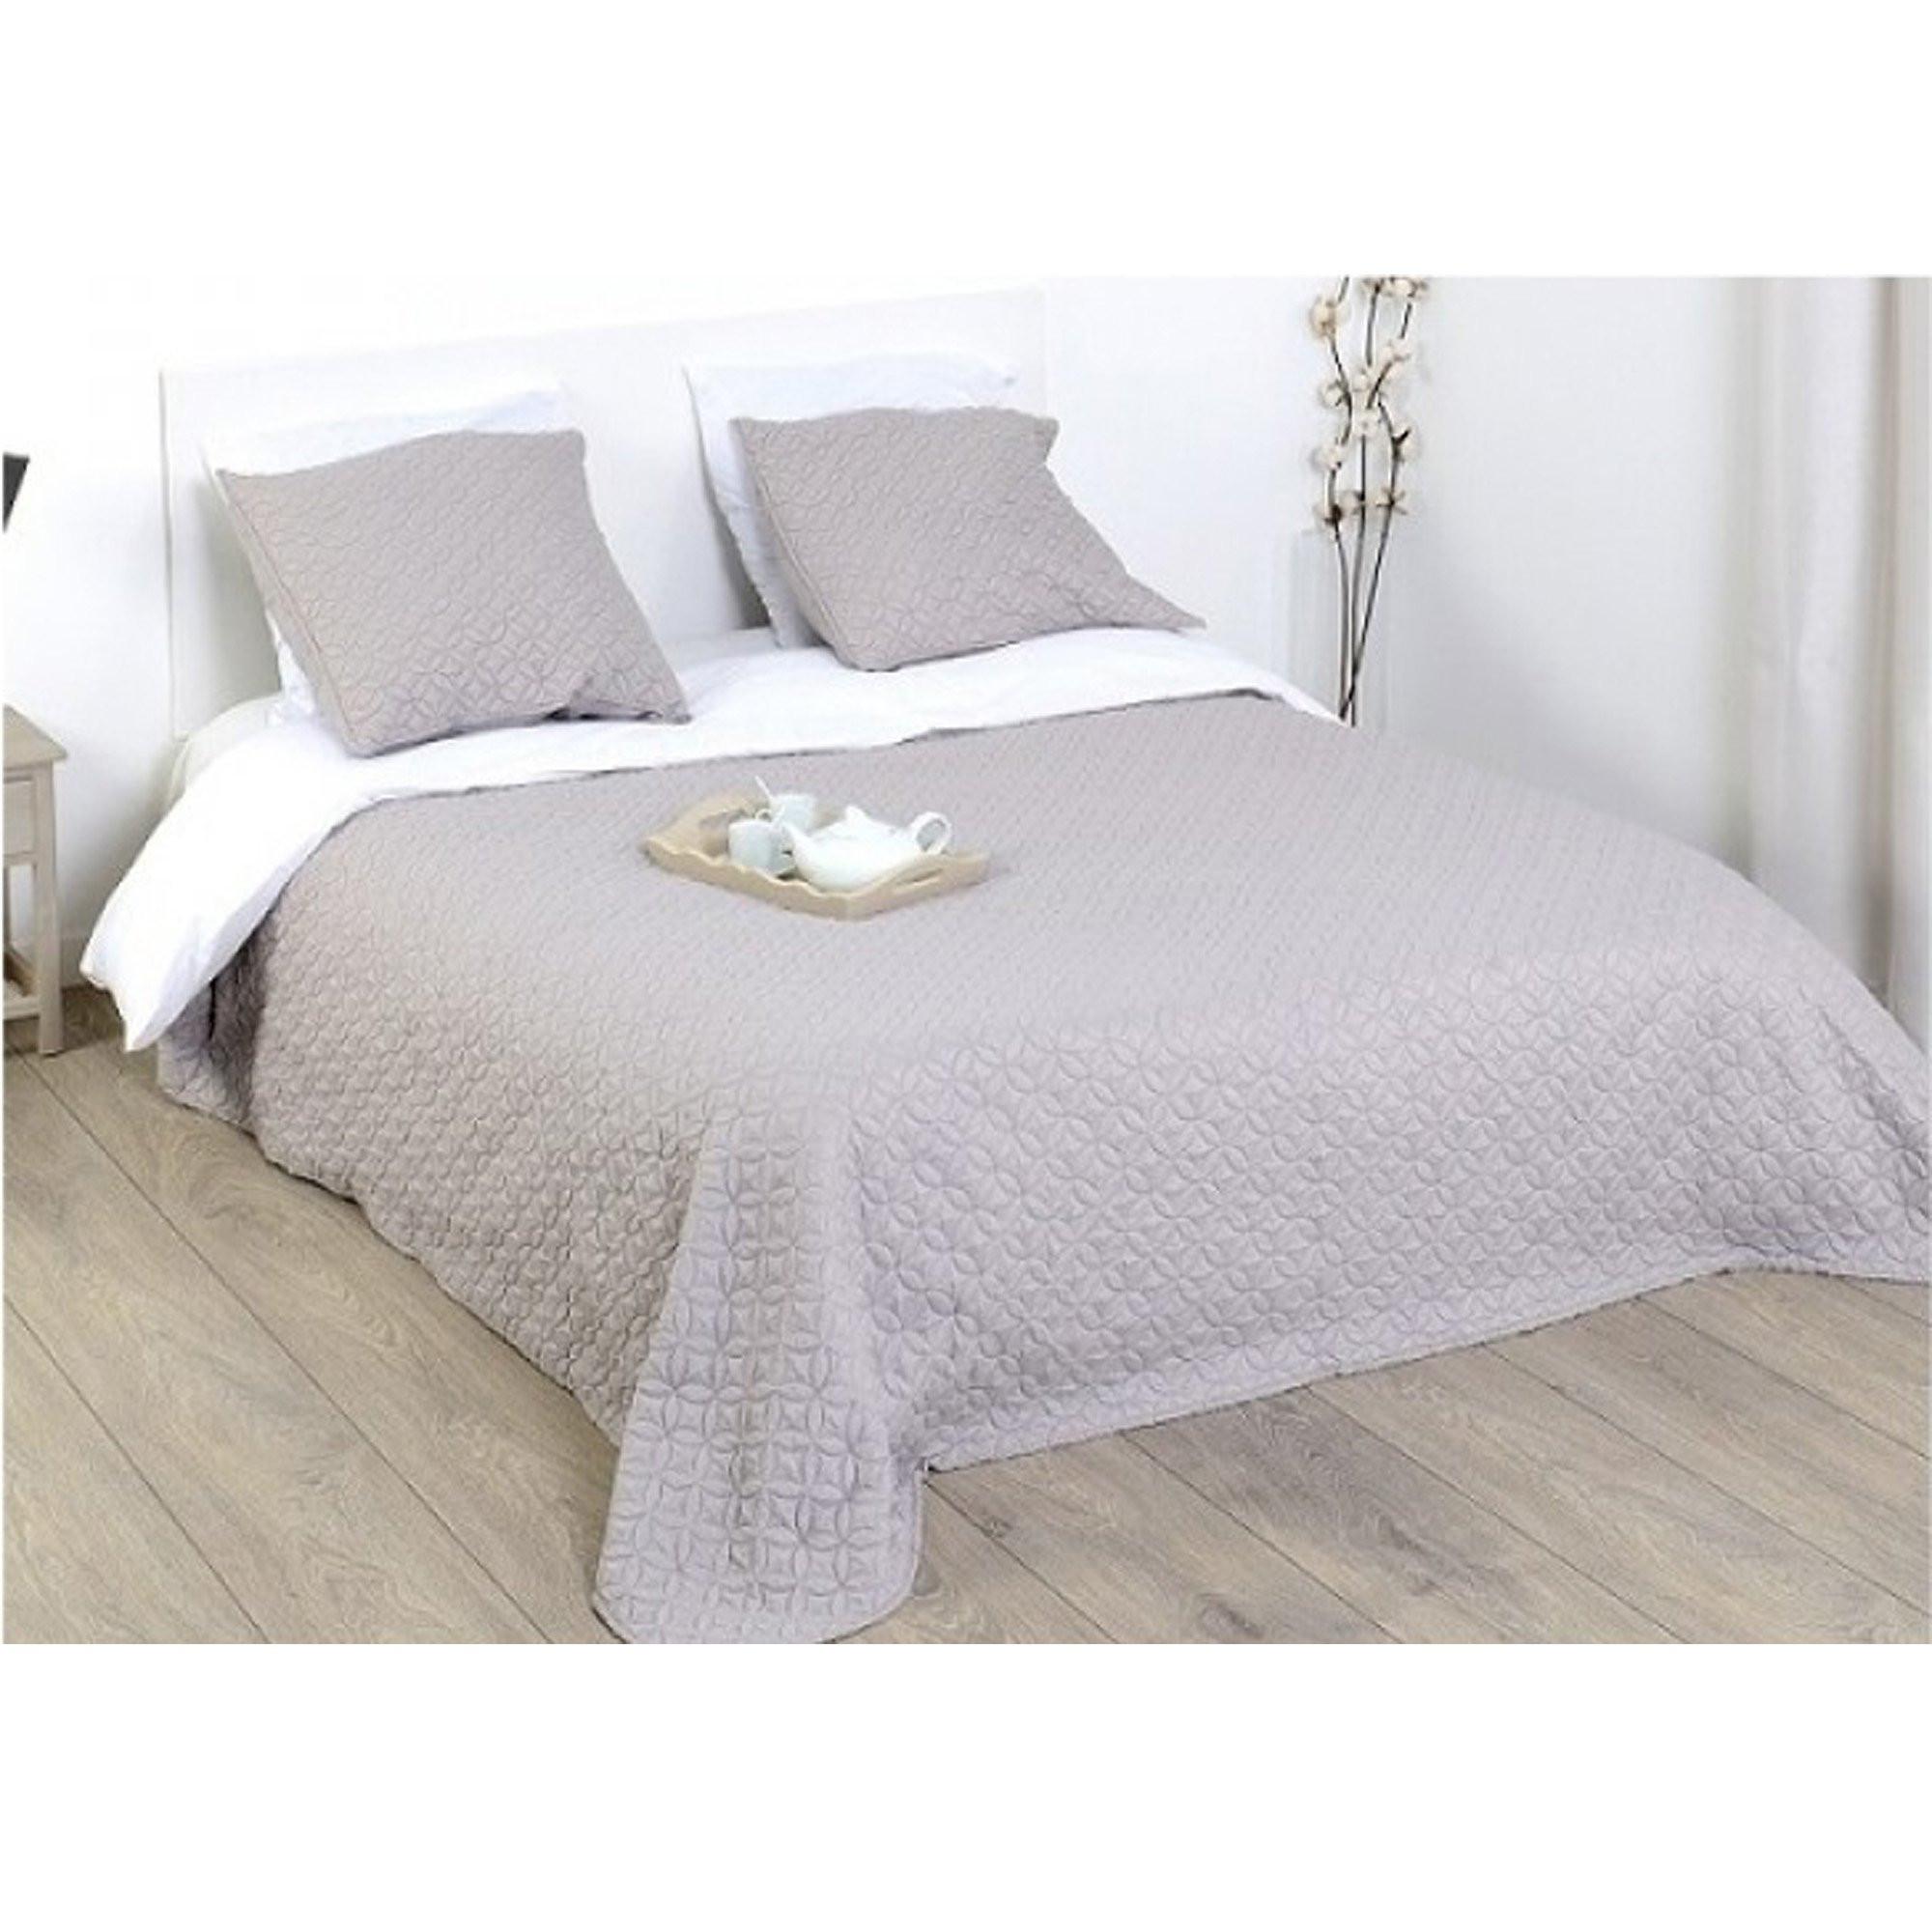 Tagesdecke Bett  Tagesdecke grau Sofa Bett Überwurf plus 2 Kissenhüllen